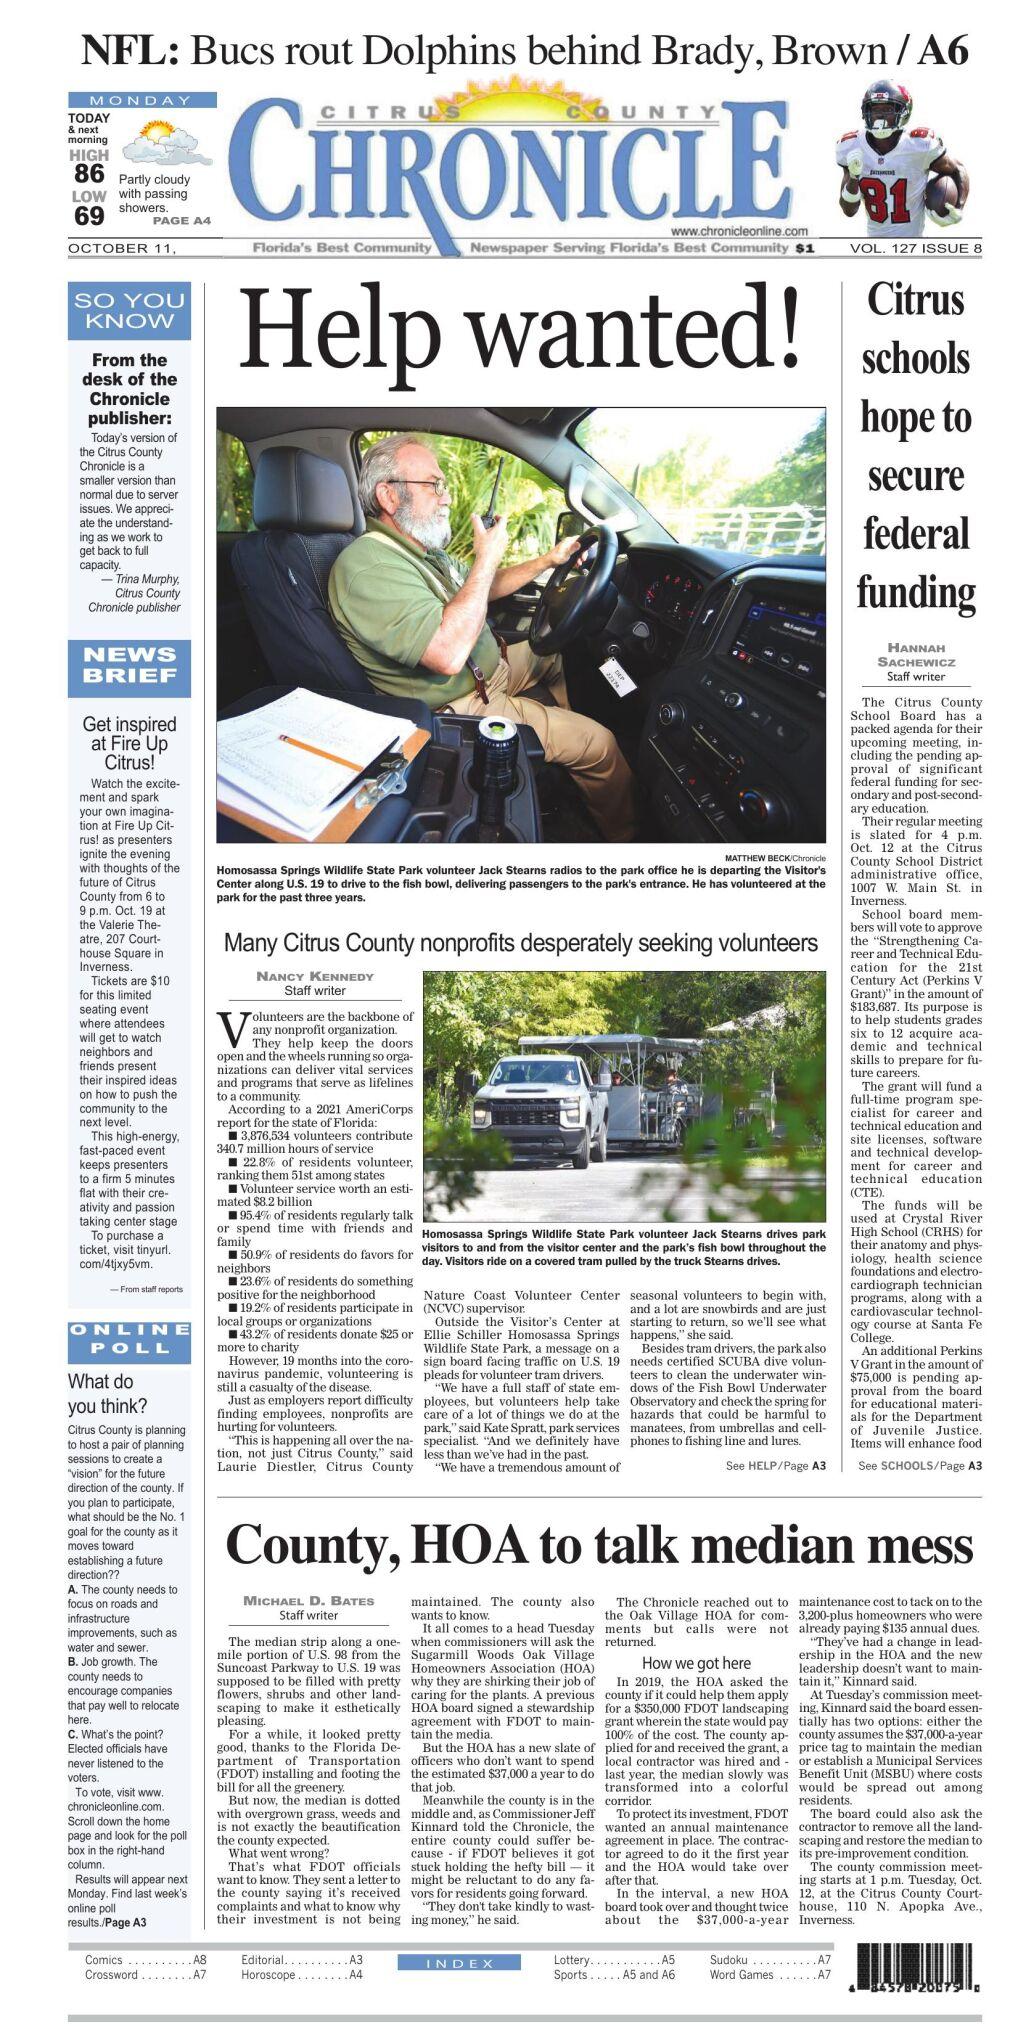 Citrus County Chronicle Oct 11, 2021 e-edition